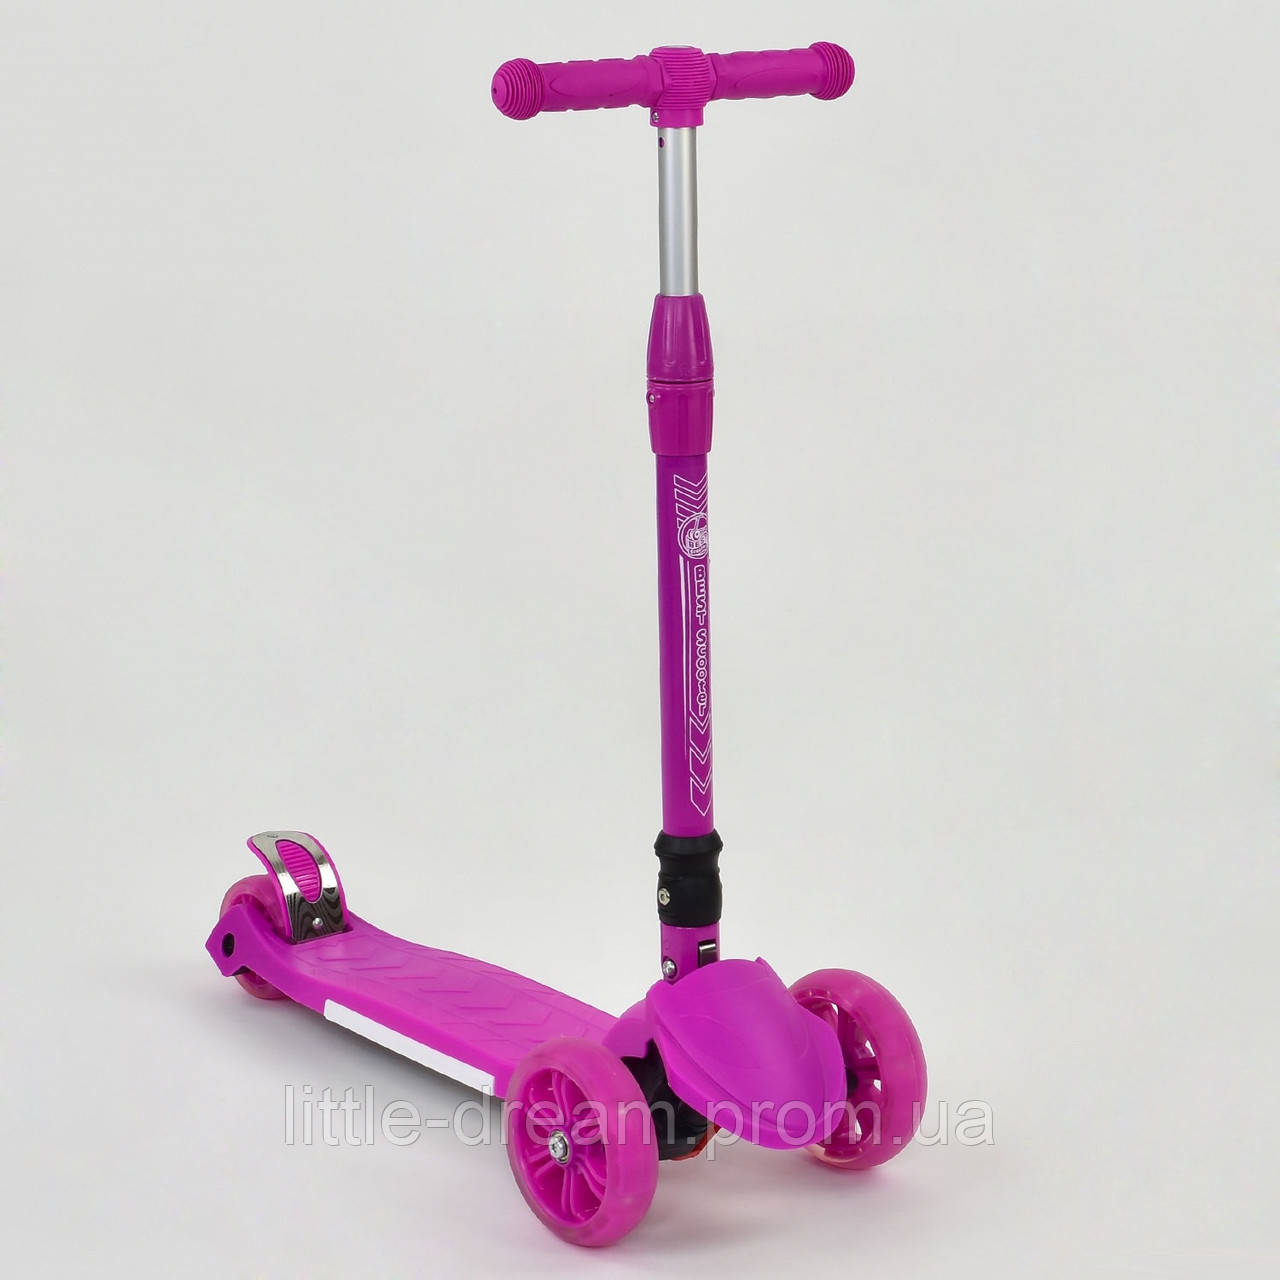 Самокат Best Scooter 769-2